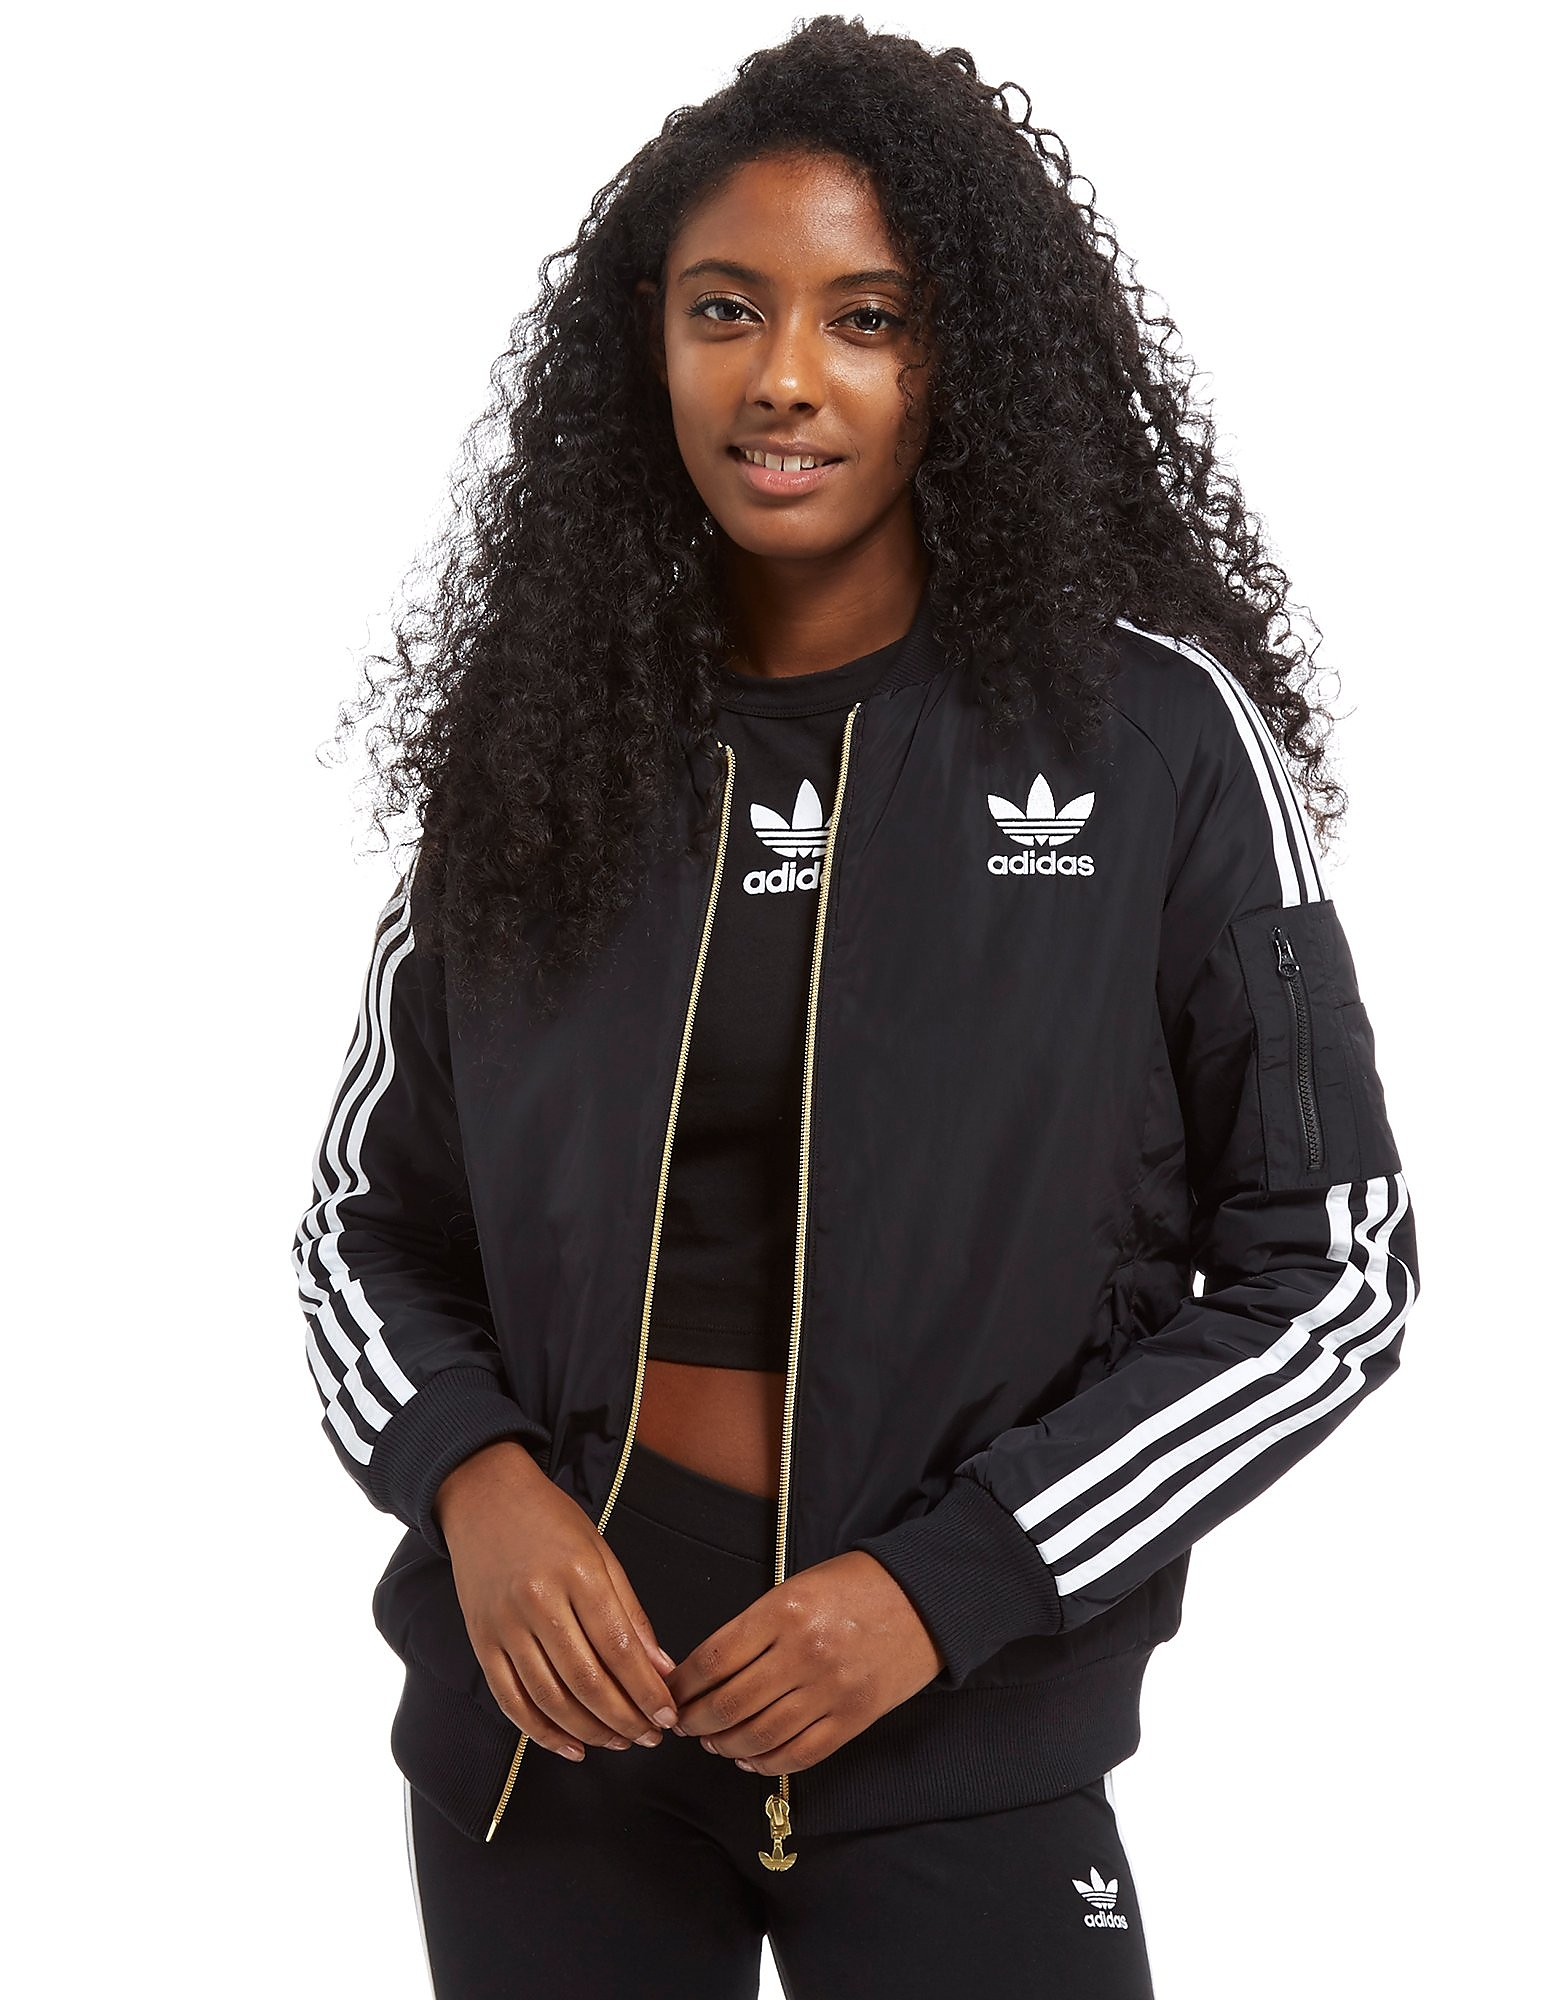 adidas Originals chaqueta Superstar